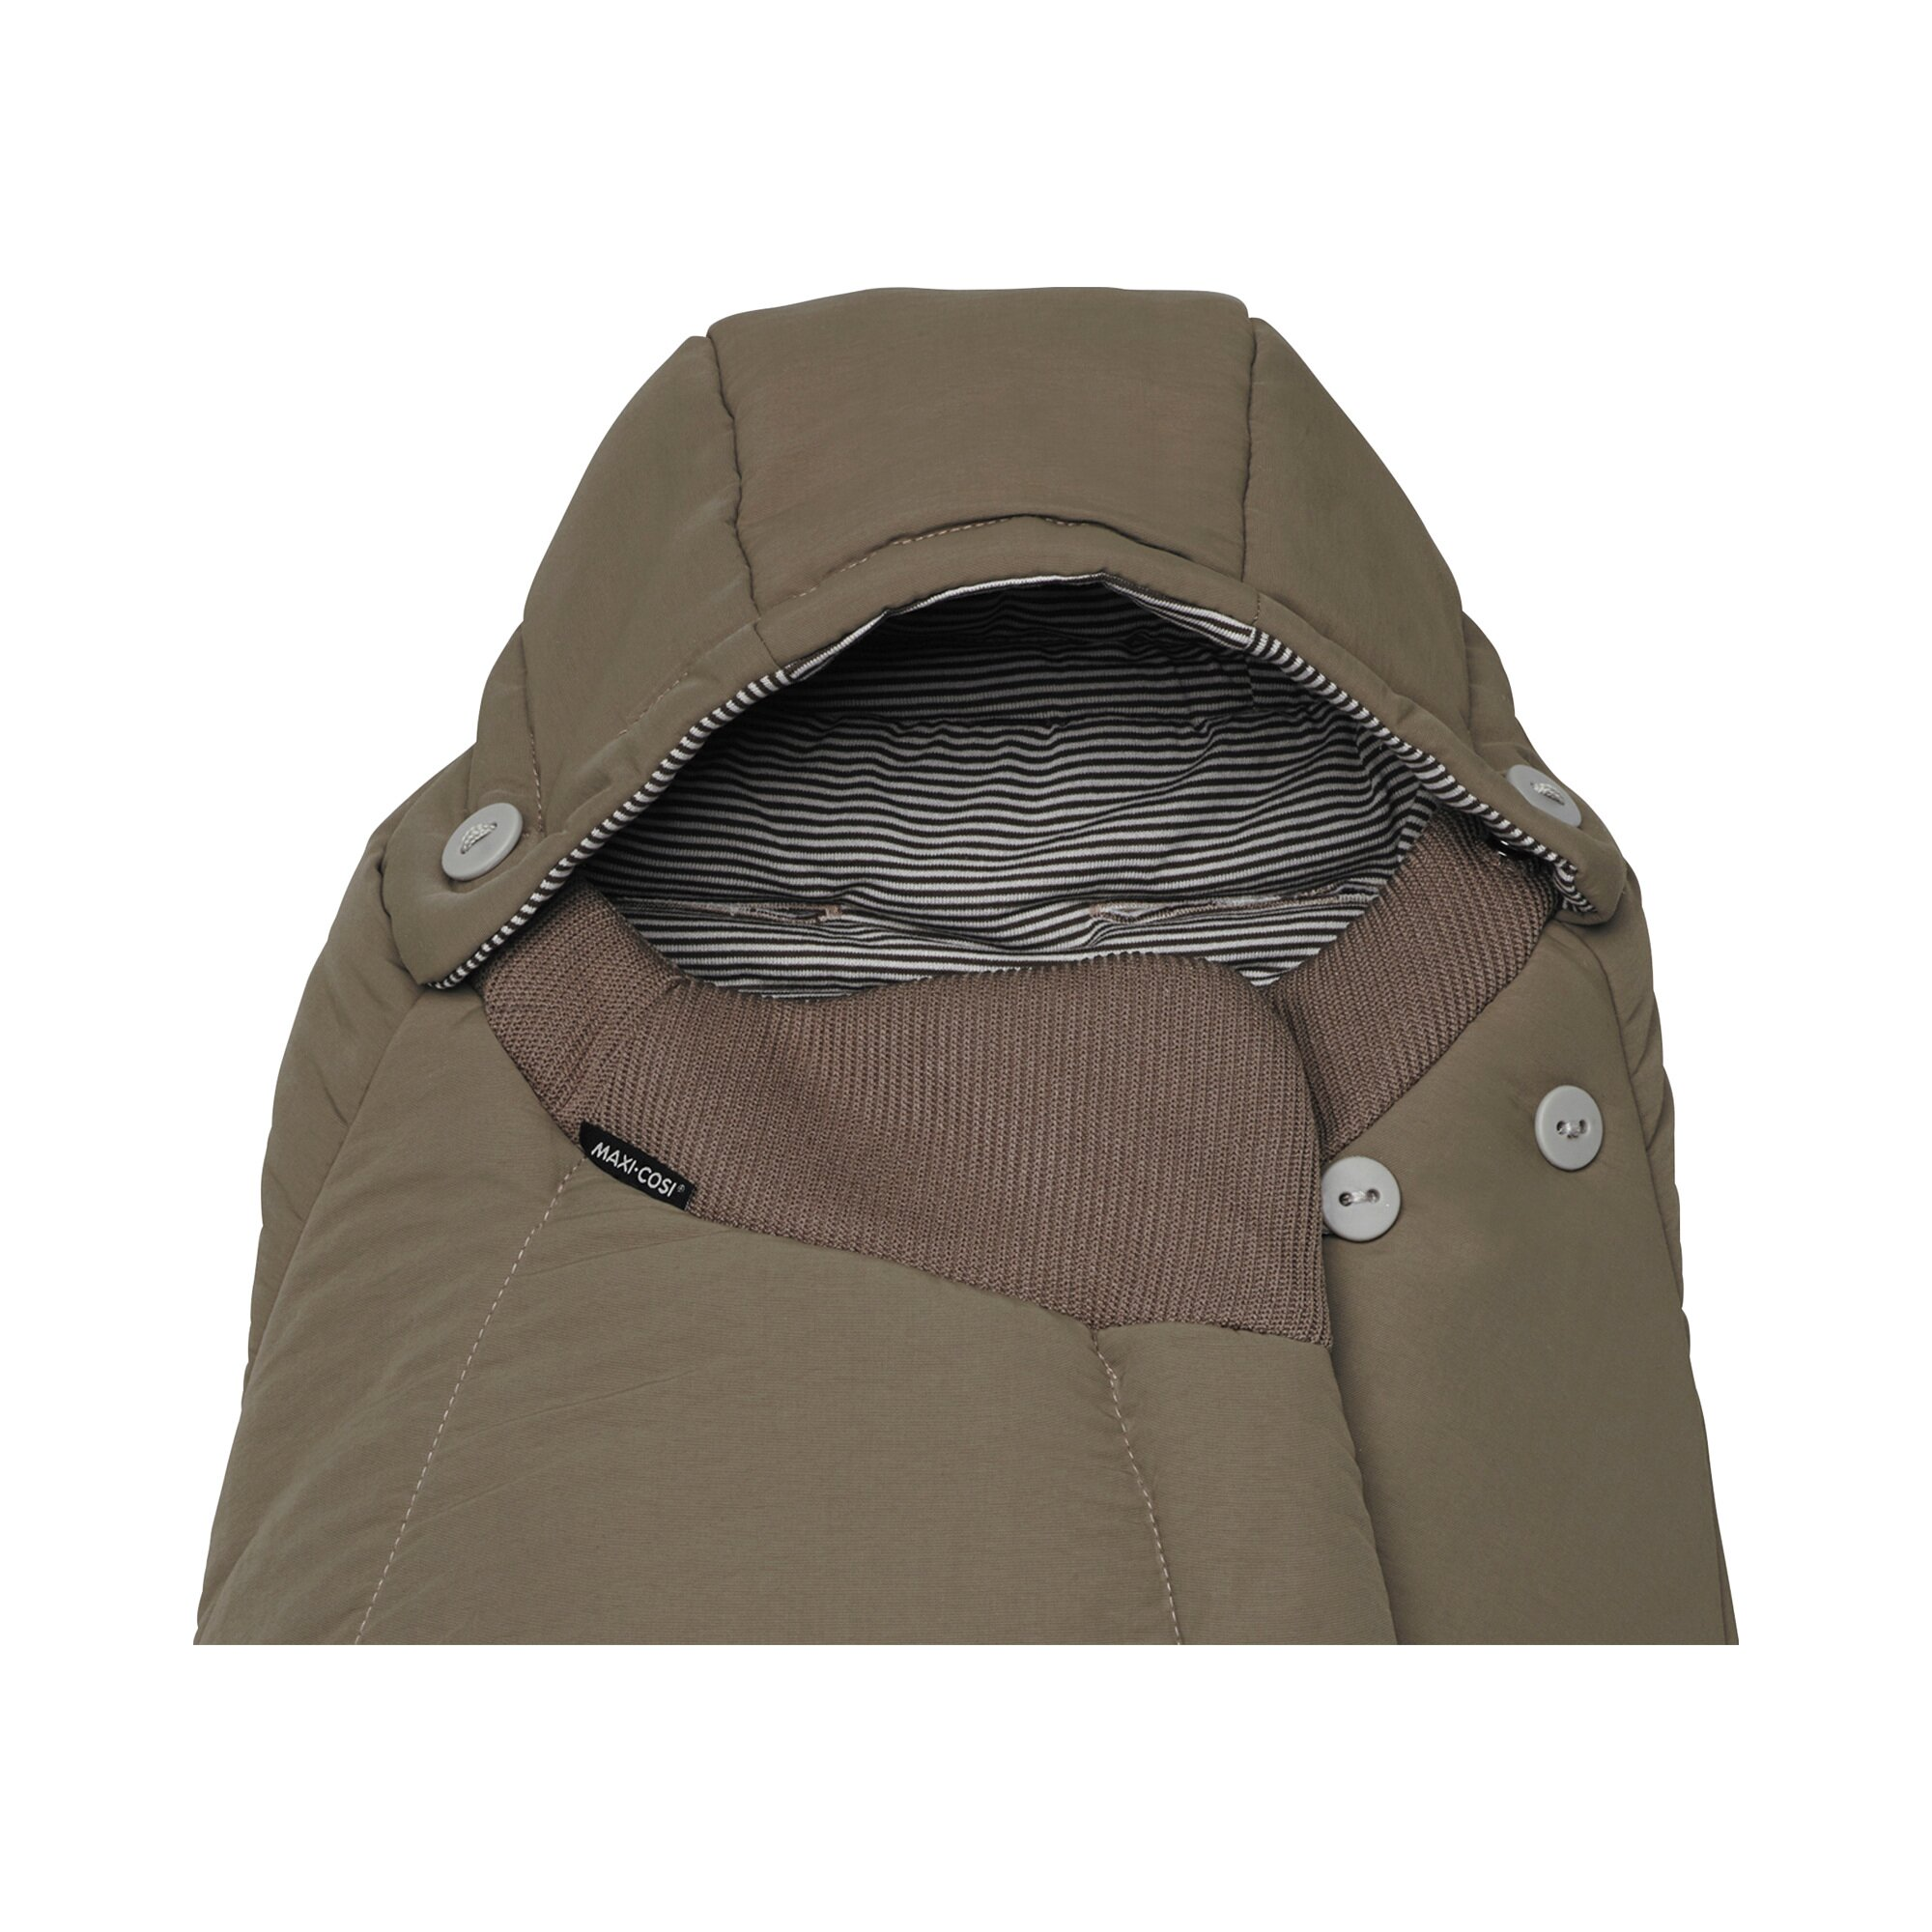 maxi-cosi-winter-fu-sack-fur-kinderwagen-mura-plus-4-dana-design-2016-braun